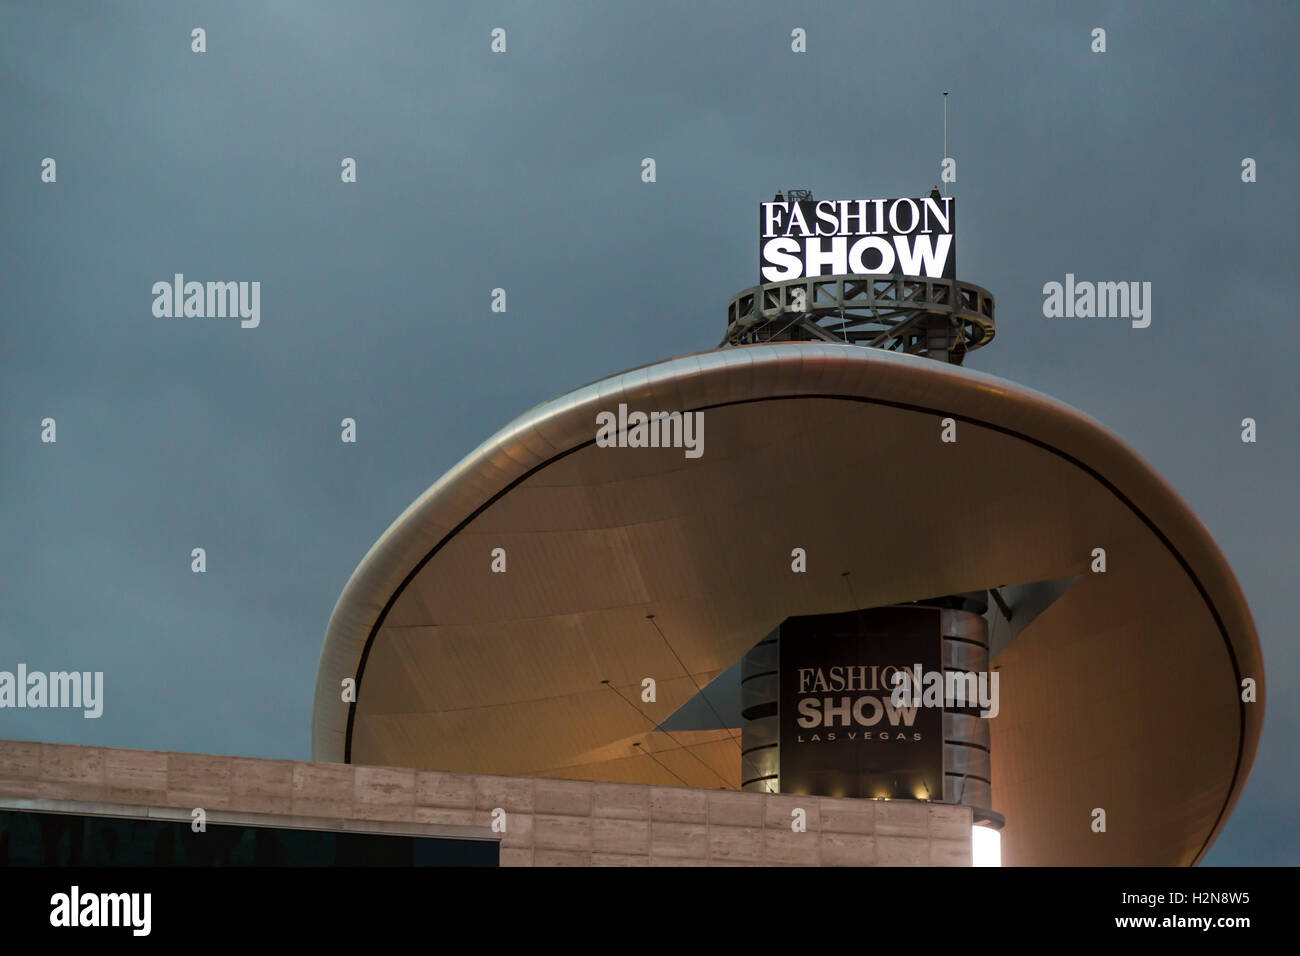 Las Vegas, Nevada - The Fashion Show shopping mall. - Stock Image